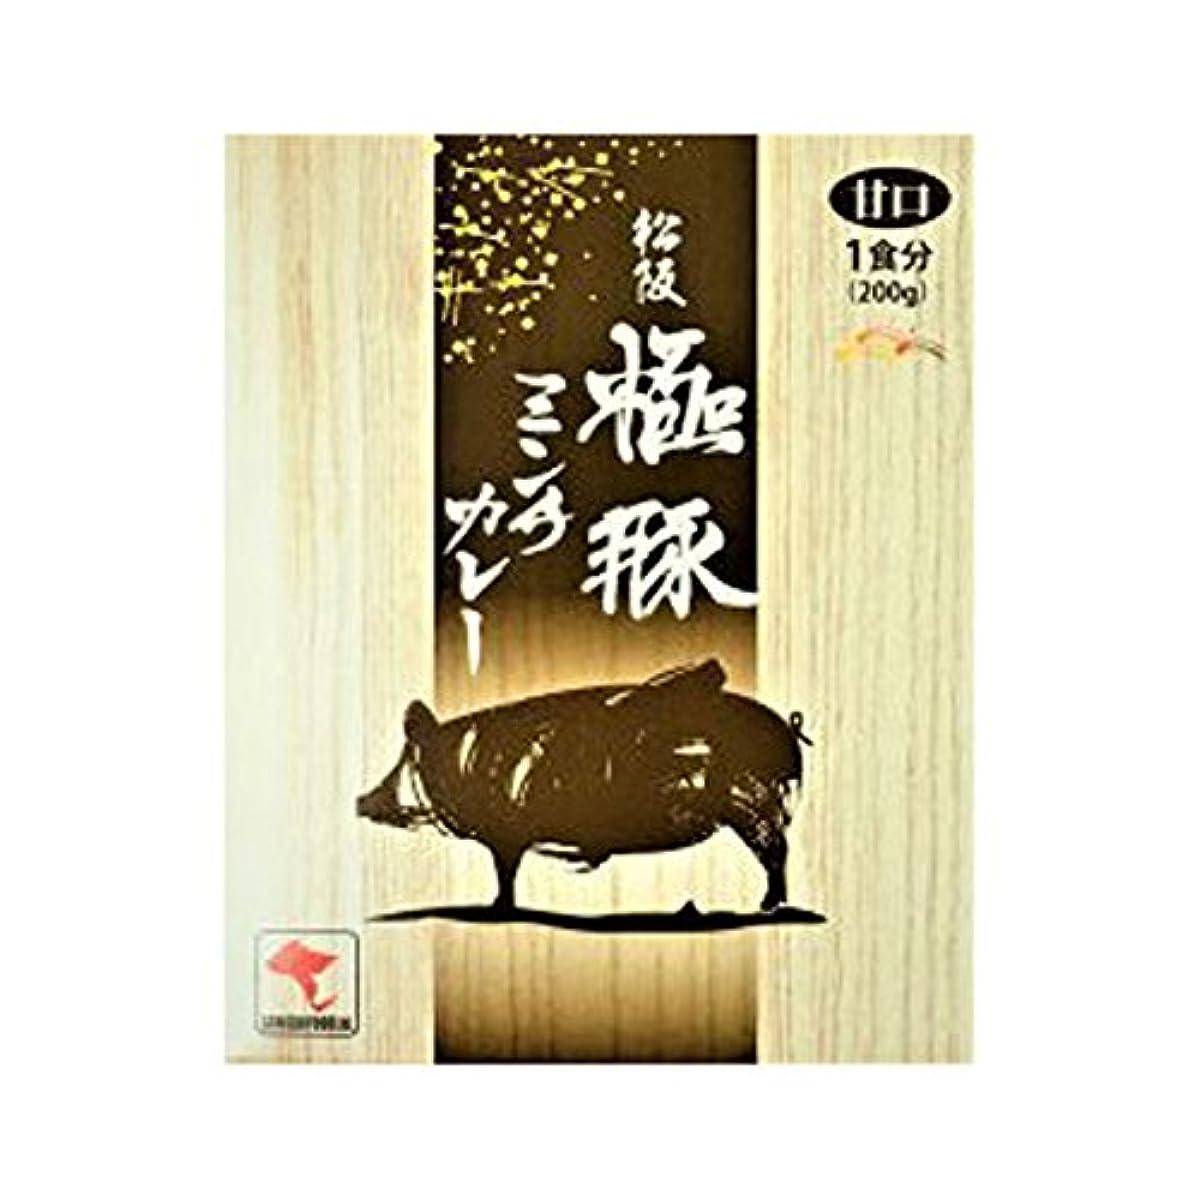 Keysystem 4967115001024 <Due Date Attention> Matsusaka Pork Curry (Sweet) Clear